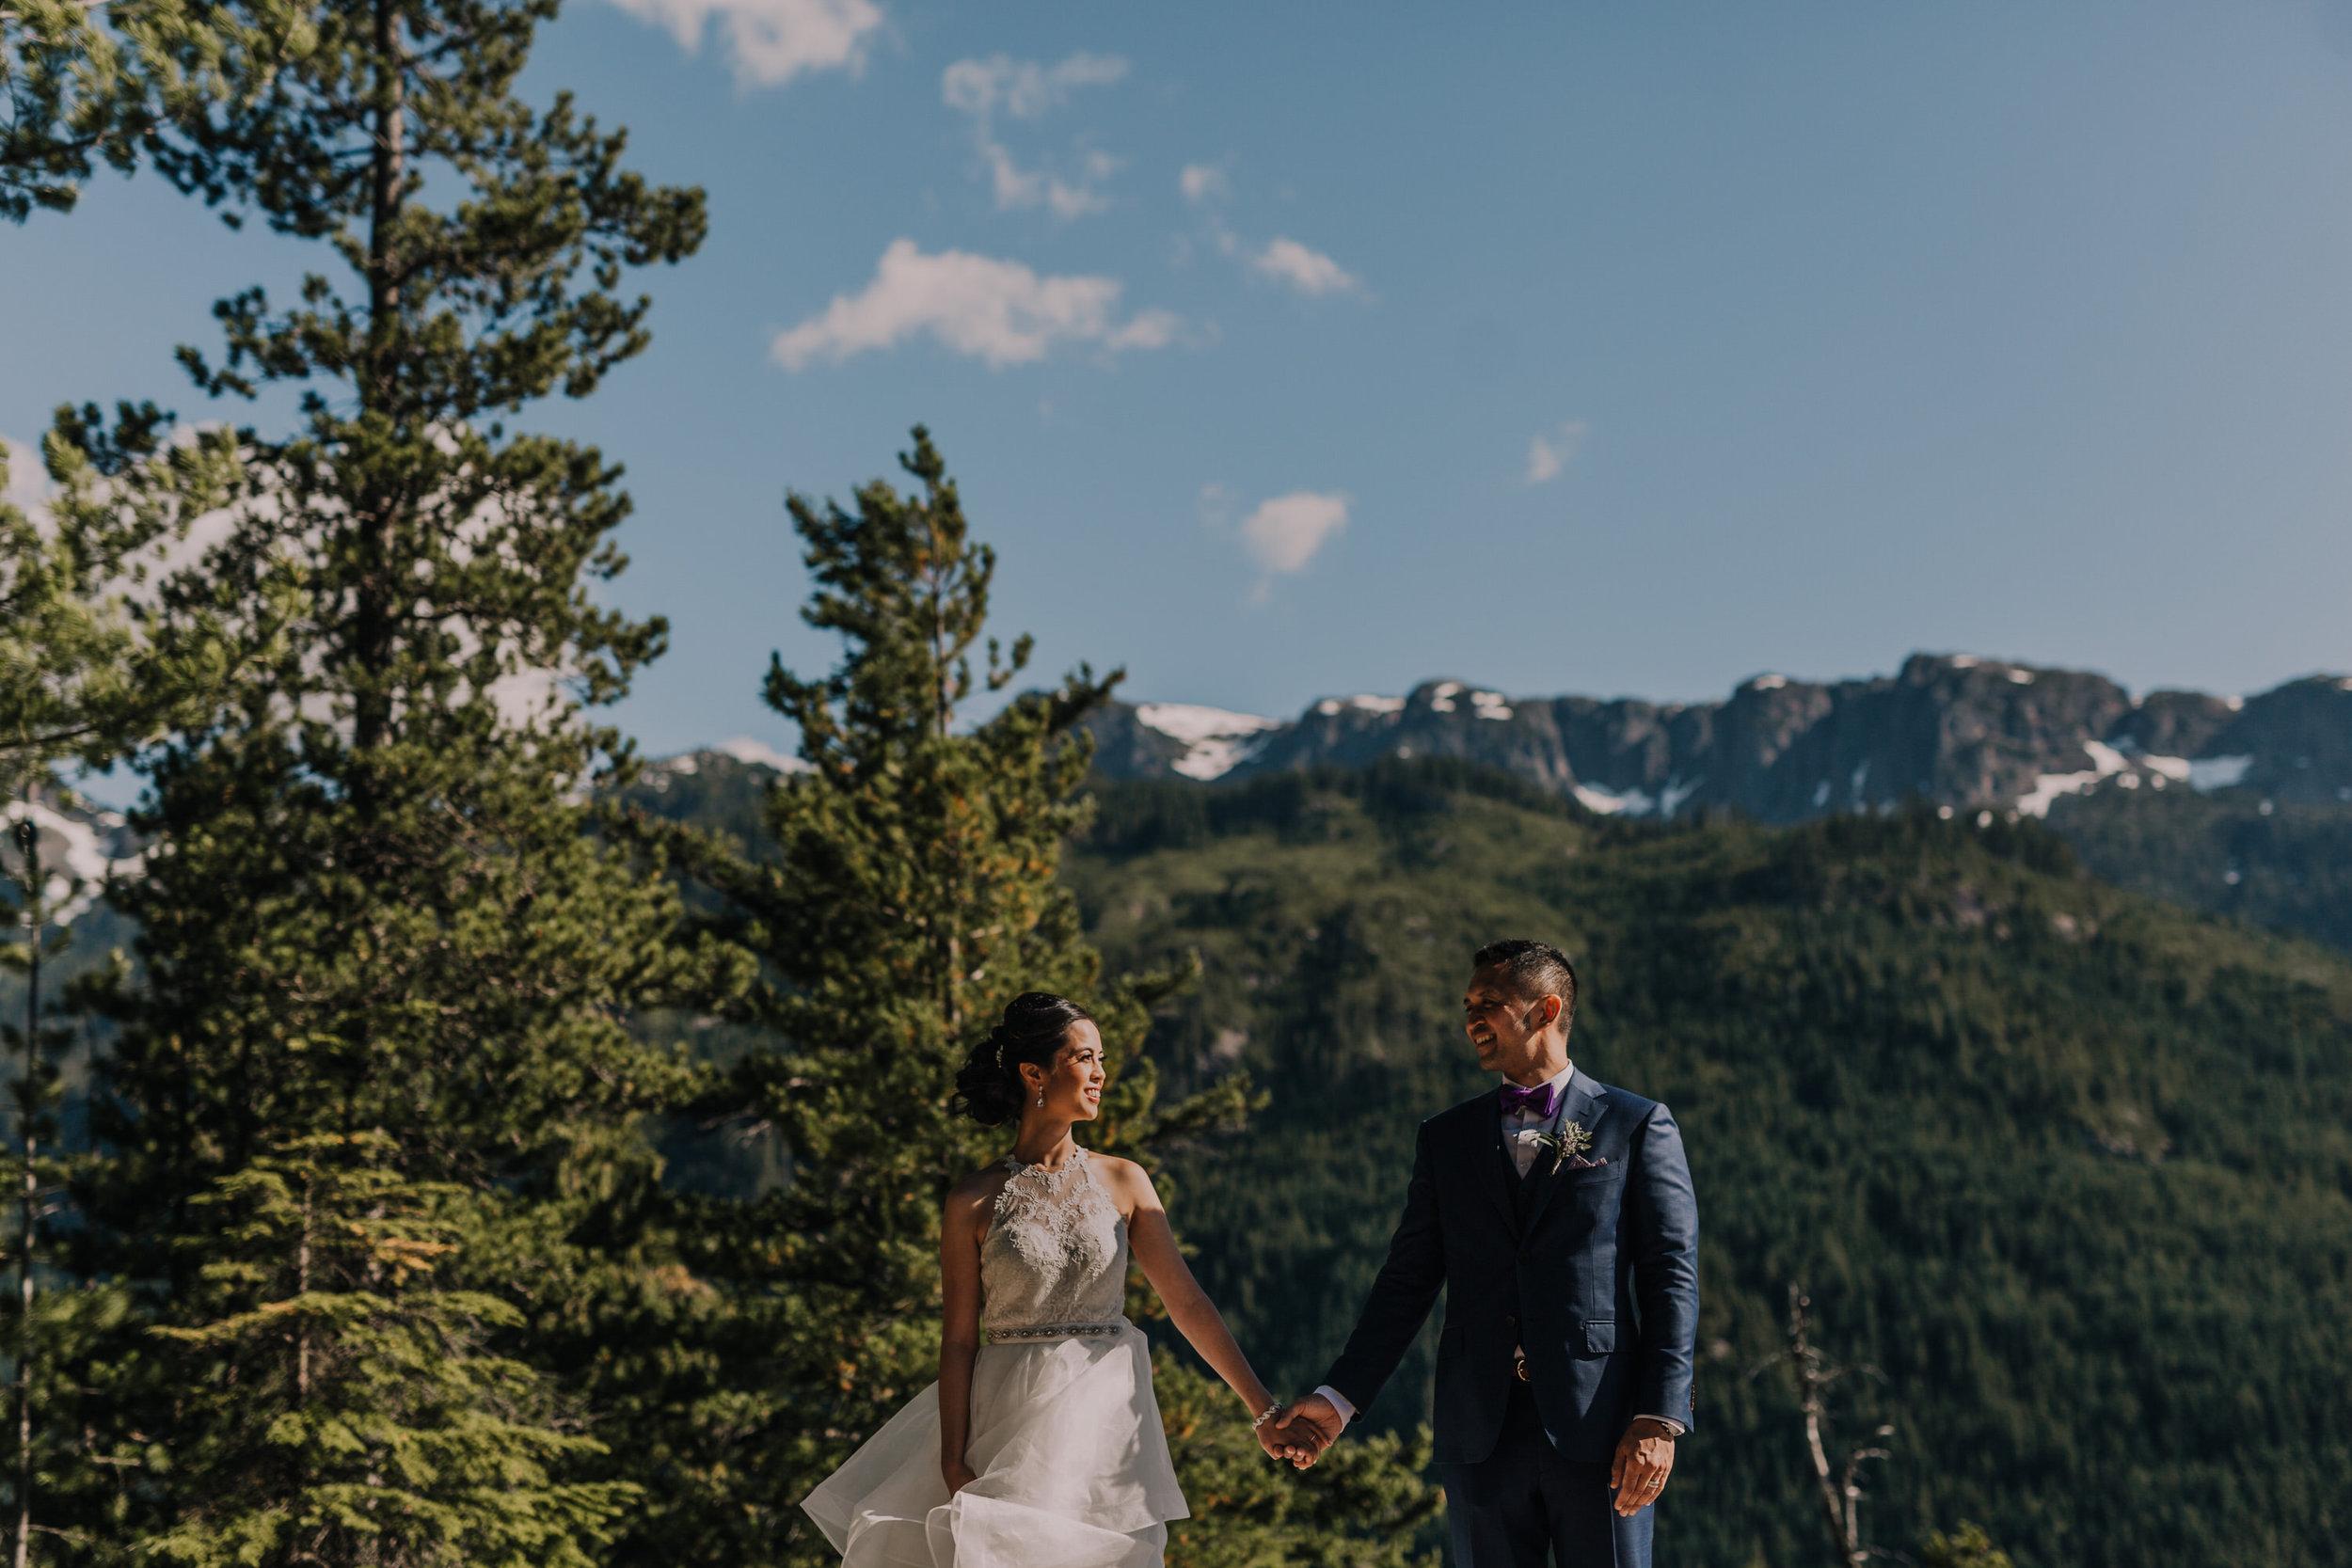 Squamish Wedding Photographer - Sea to Sky Gondola Wedding Photos -  Vancouver Wedding Photographer & Videographer - Sunshine Coast Wedding Photos - Sunshine Coast Wedding Photographer - Jennifer Picard Photography - IMG_3822.jpg